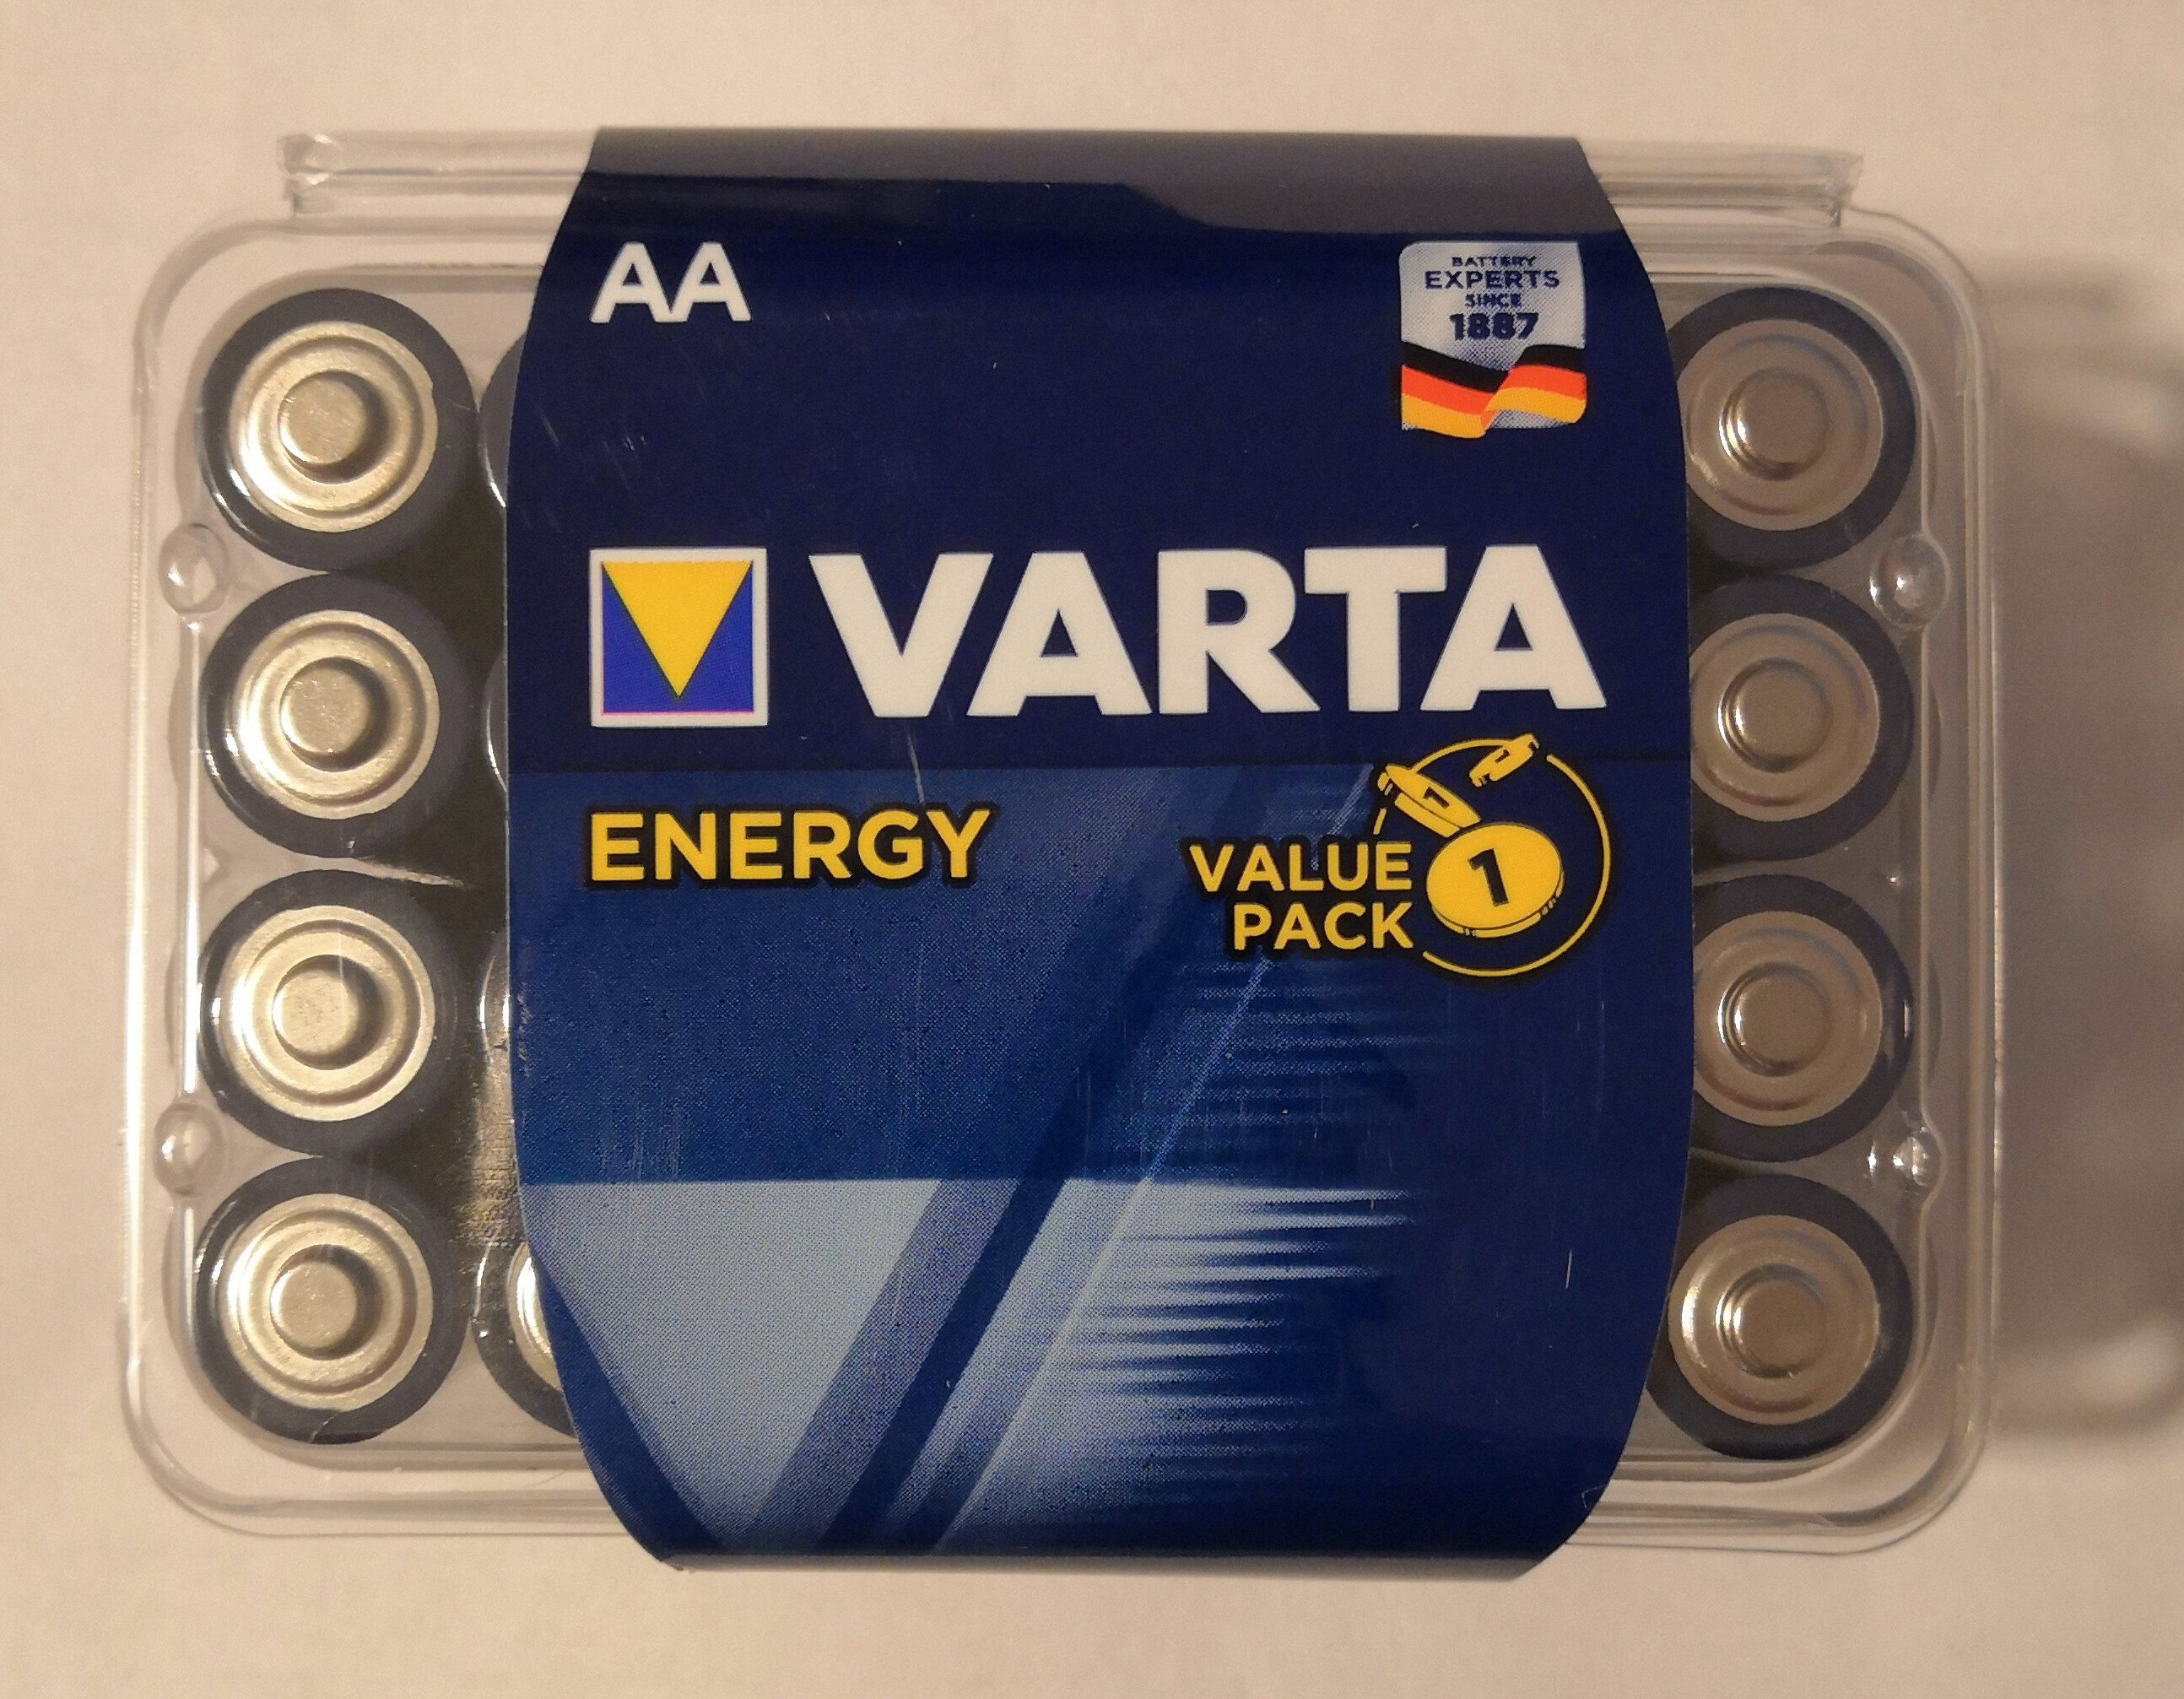 VARTA Energy AA - Product - de